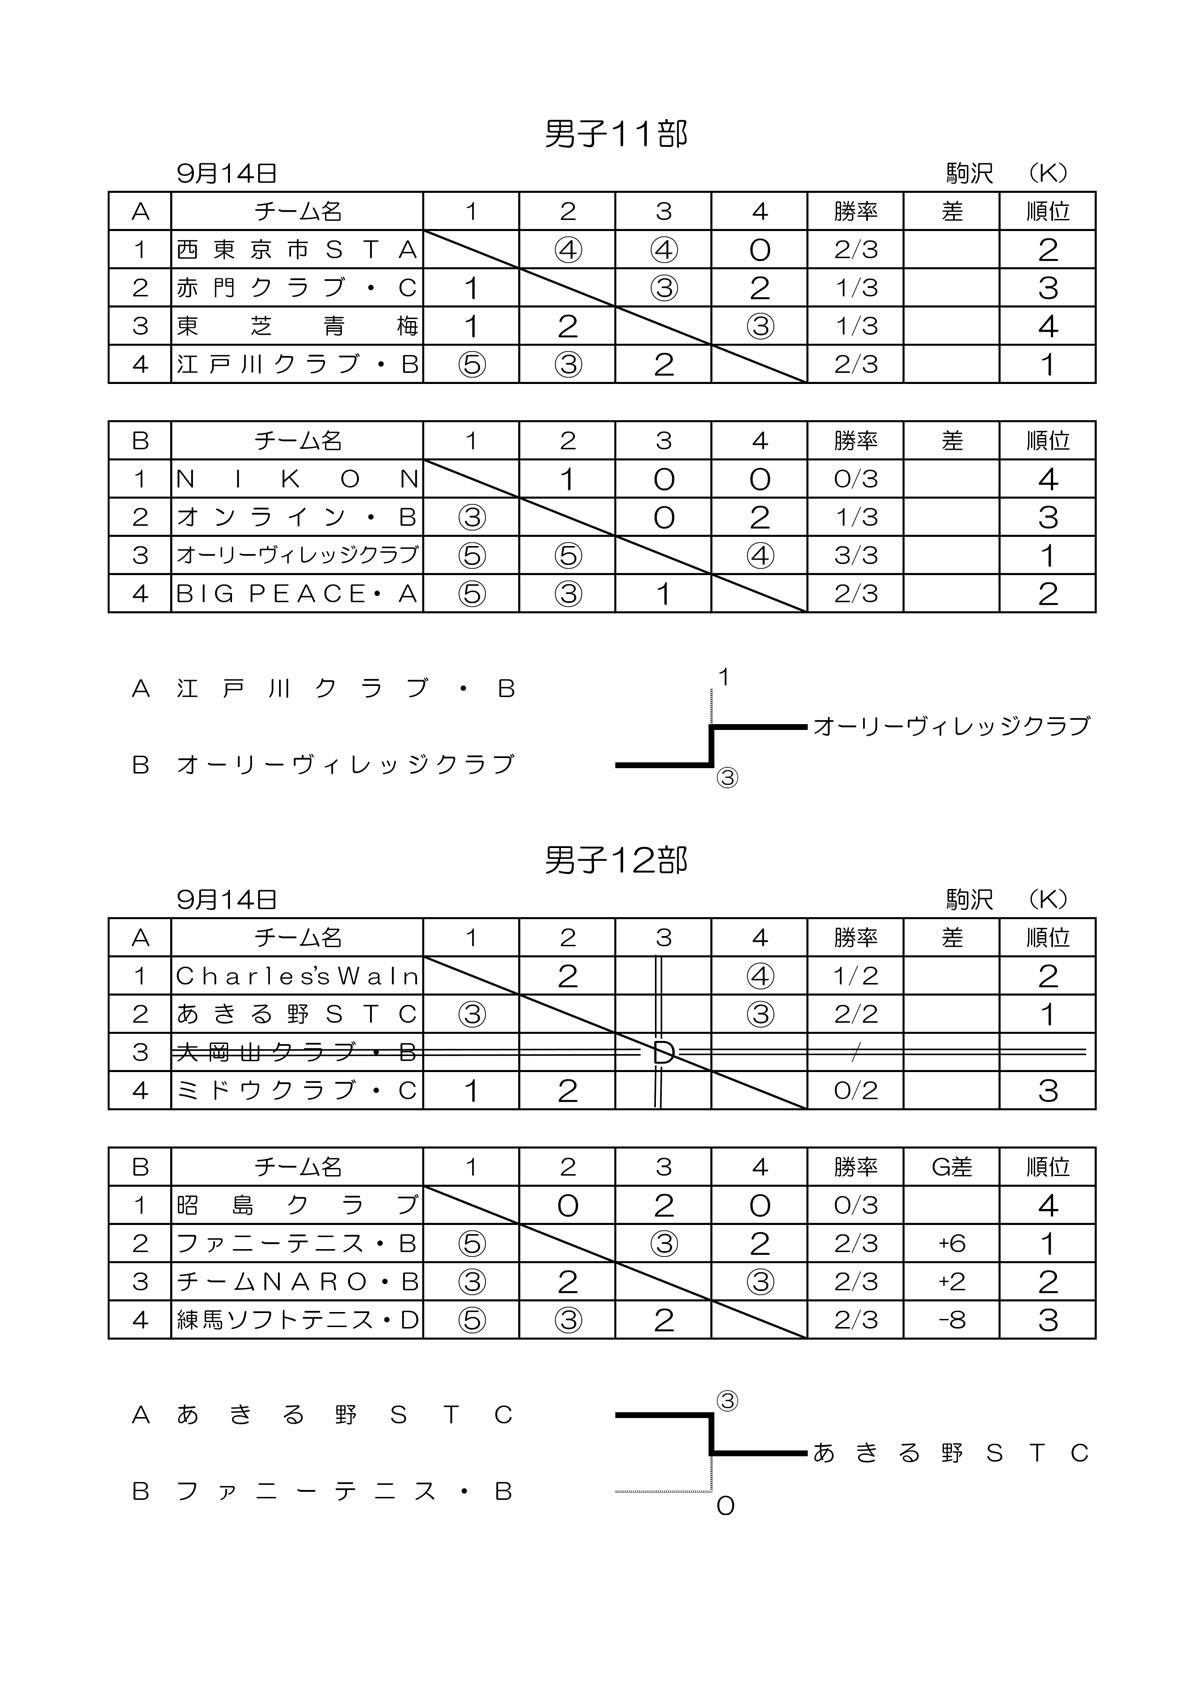 令和元年度 東京都秋季クラブ戦結果